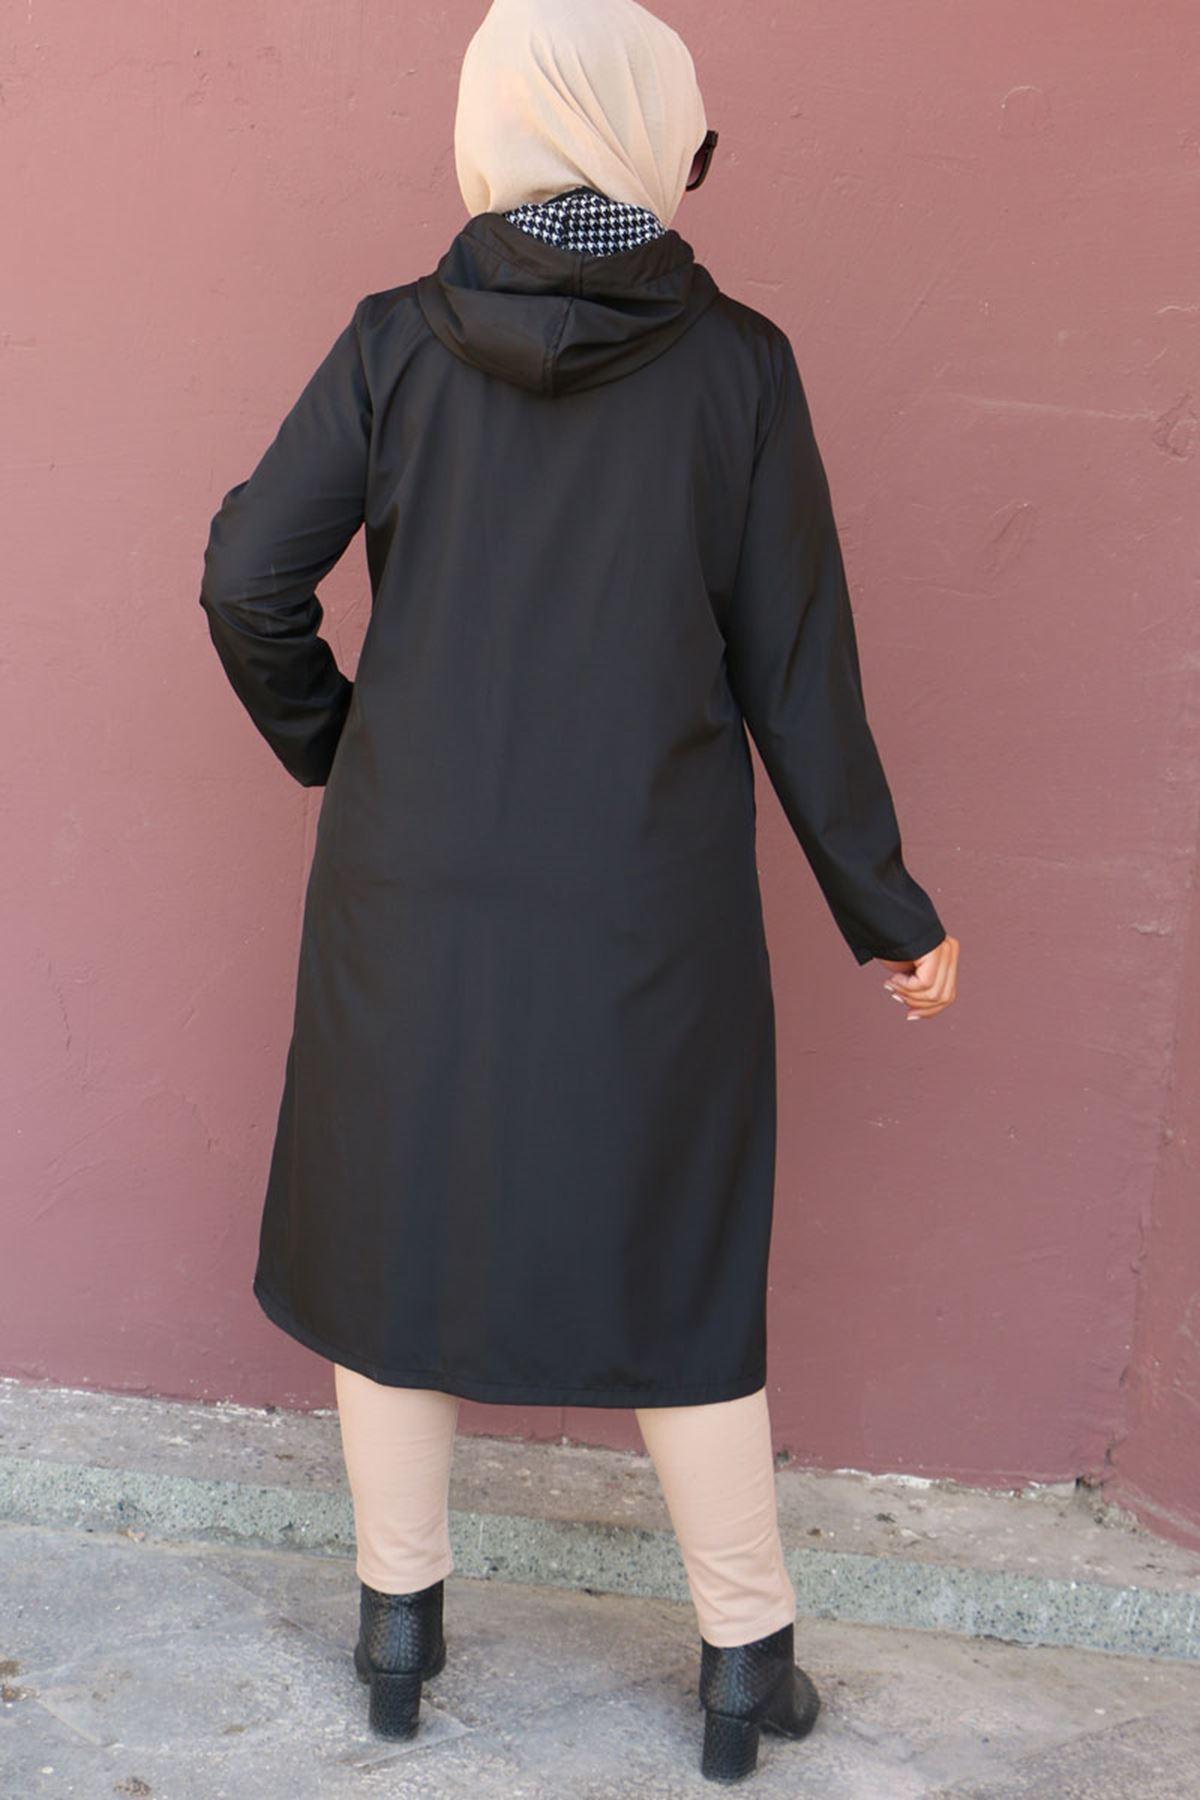 916 Büyük Beden Kapüşonlu Bondit Trençkot - Siyah